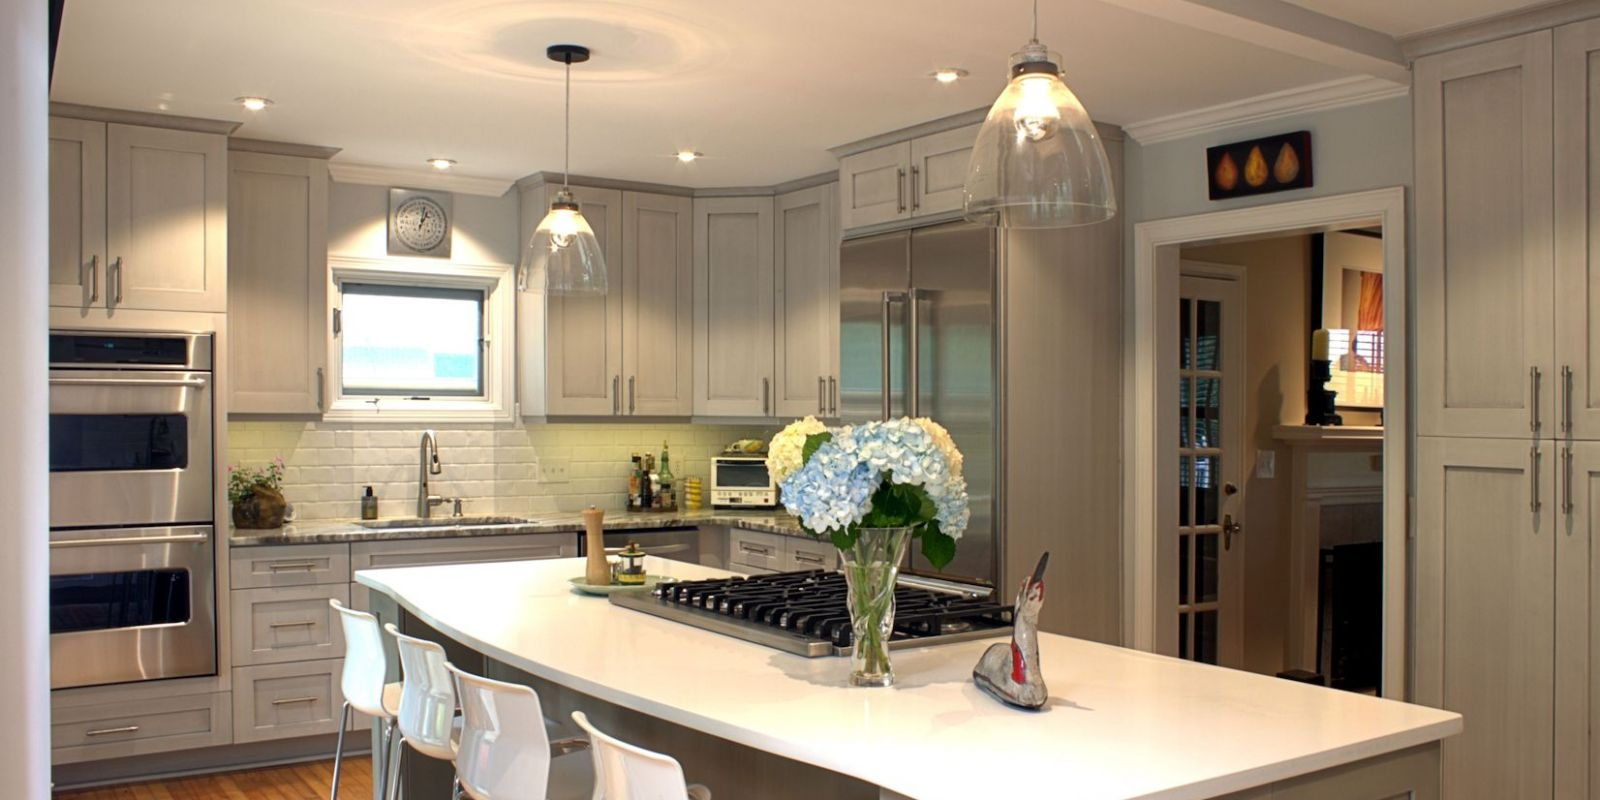 Kitchens   Platinum Kitchens & Design, Inc.